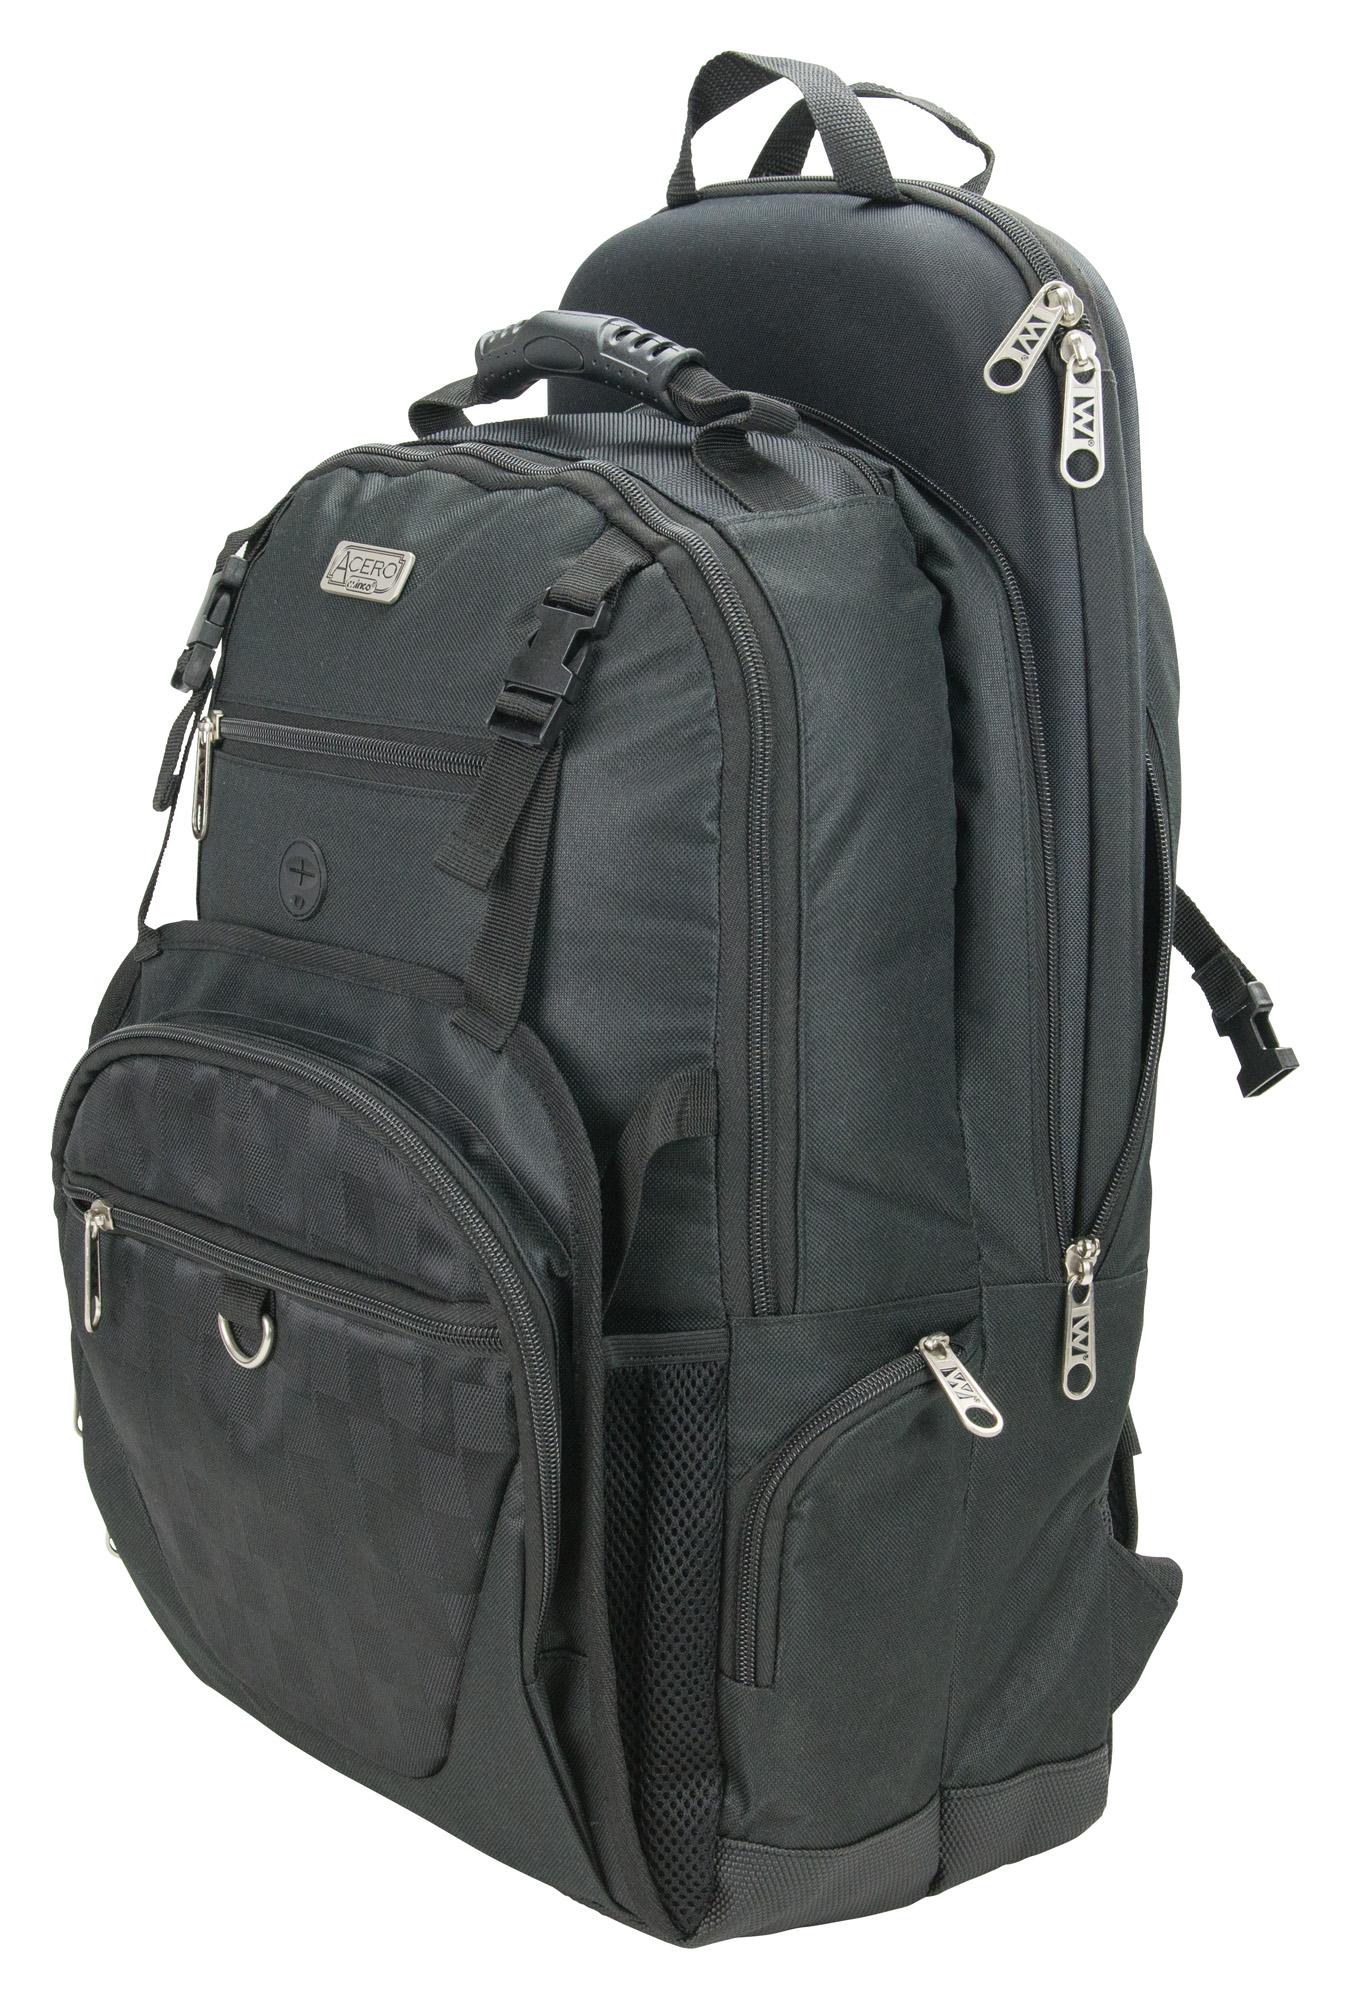 Winco KBP-S backpack with inner knife case set